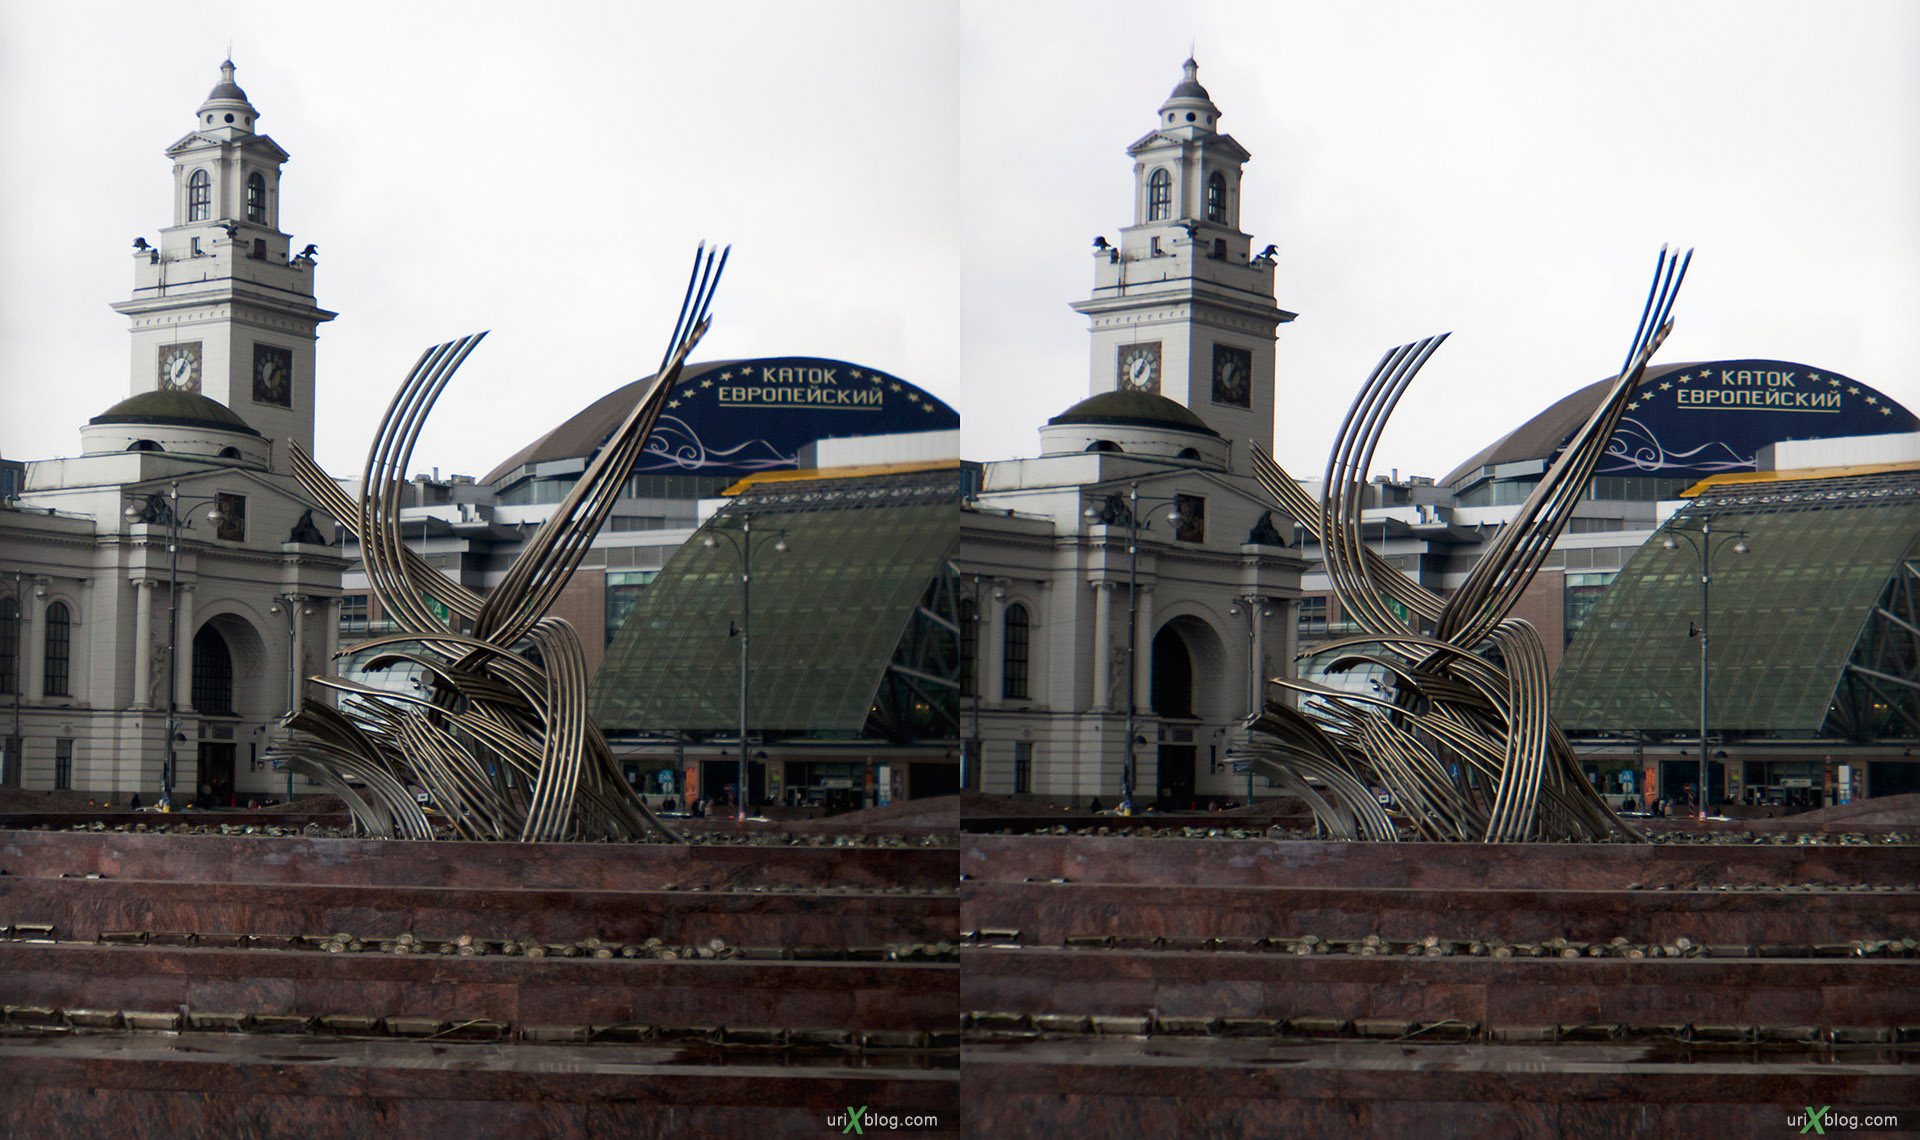 Loreo 3D lens in a cap стерео, стереопара Moscow, Square of Europe, Москва, Площадь Европы, stereo, стерео, cross-eyed, 3D